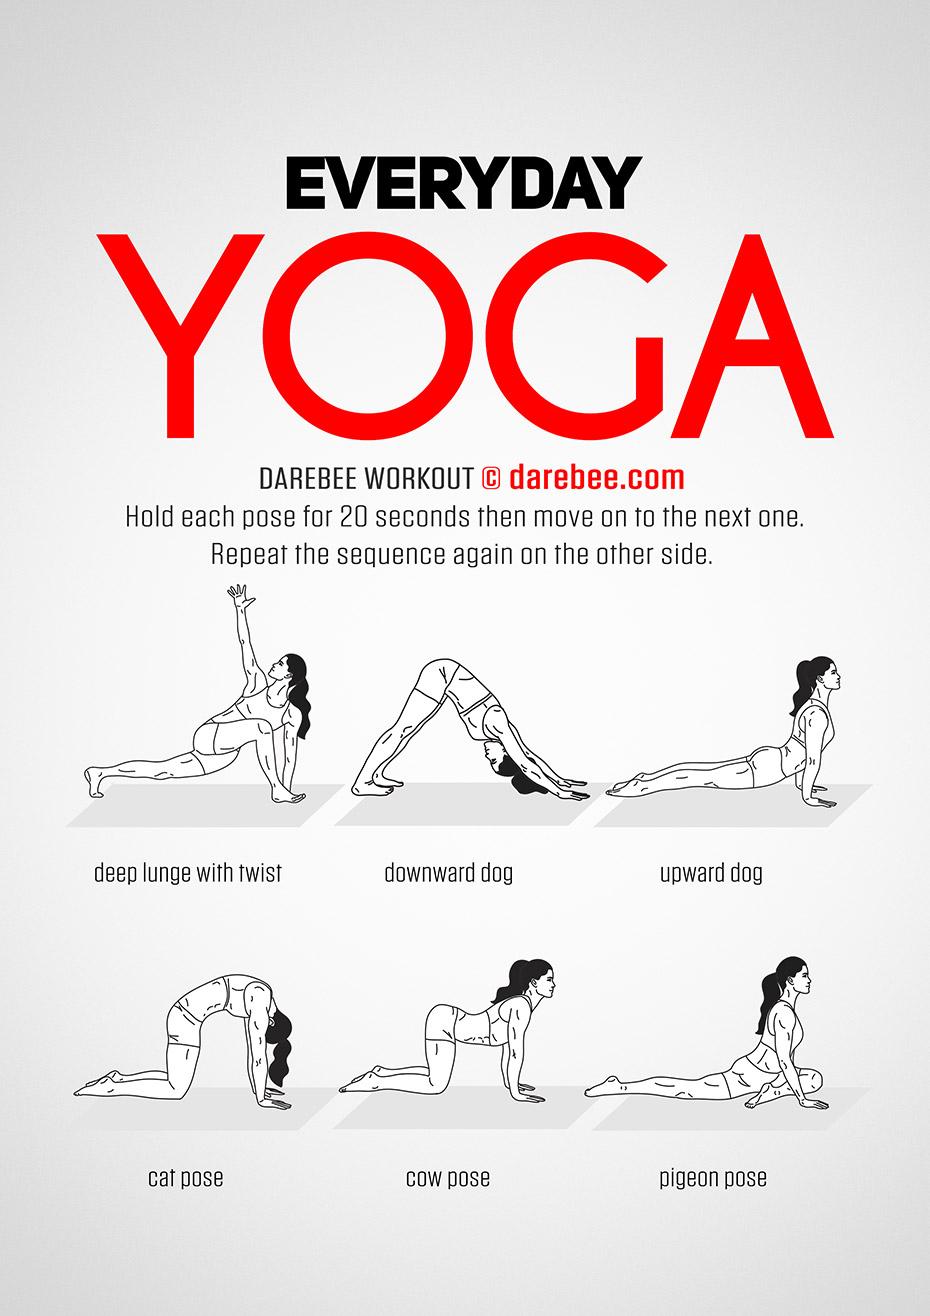 Everyday Yoga Workout